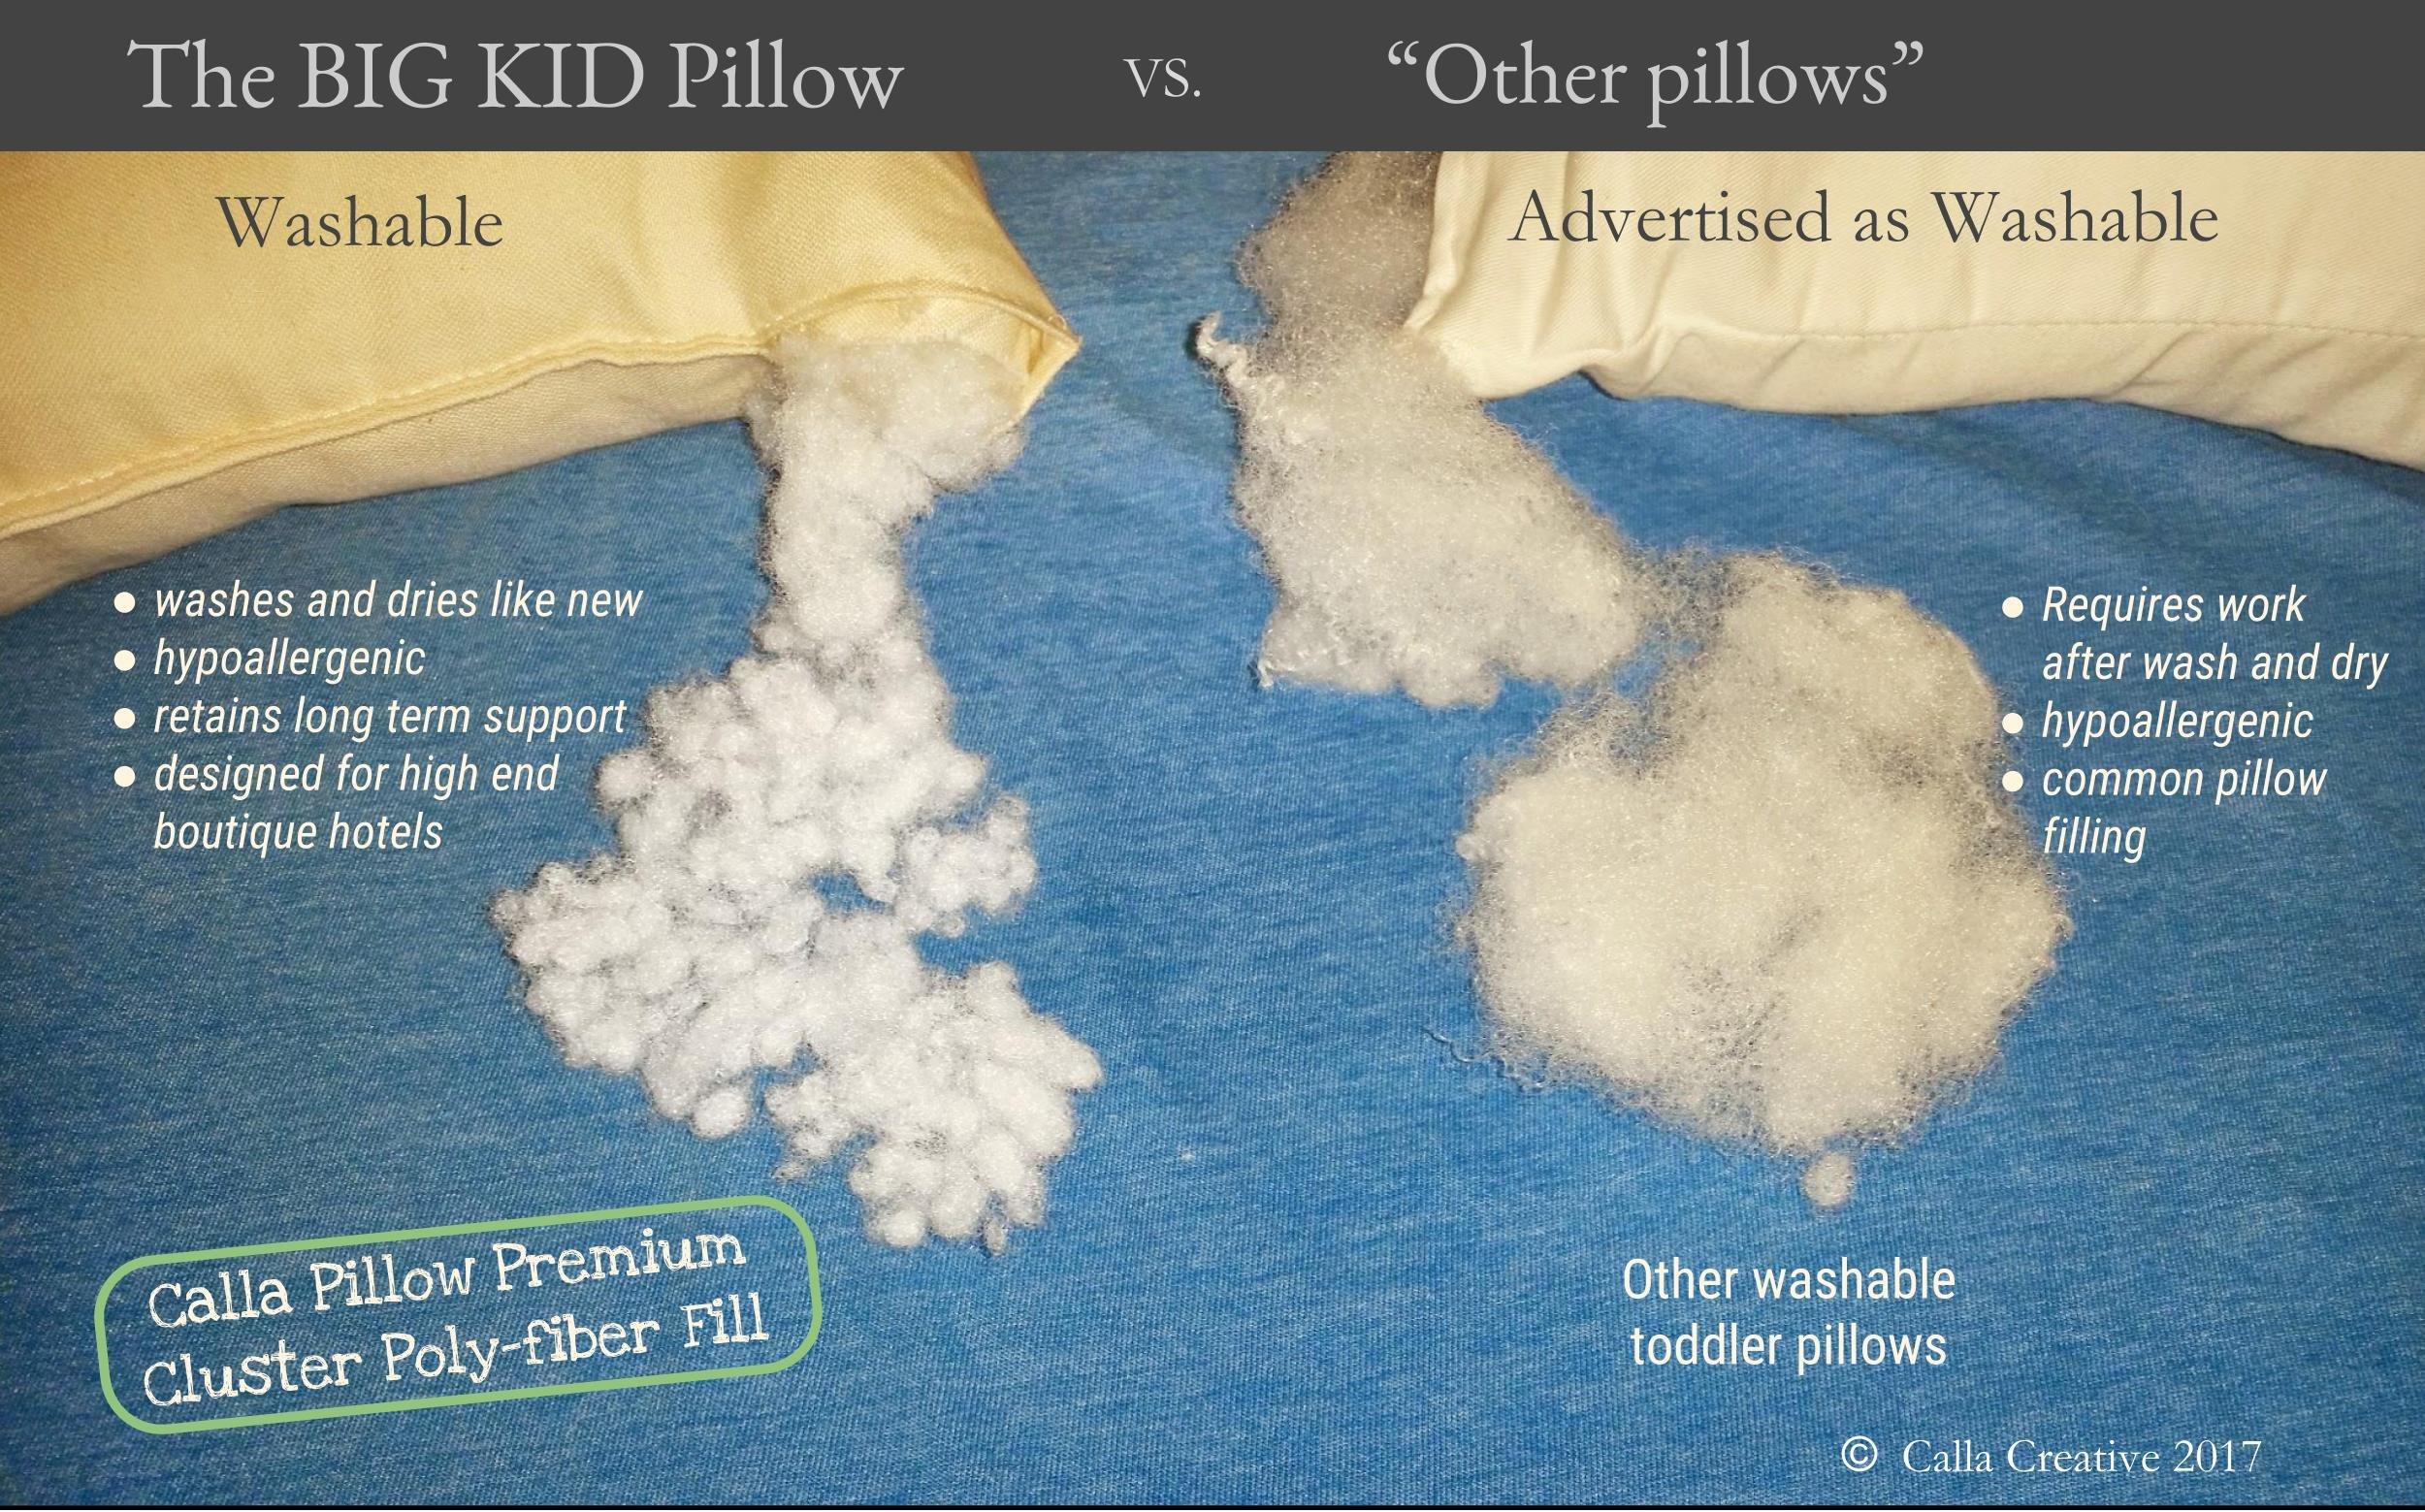 Calla Toddler Pillow Soft Organic Cotton of size 13'' x 18'' x 3.5'' by Calla Creative (Image #2)